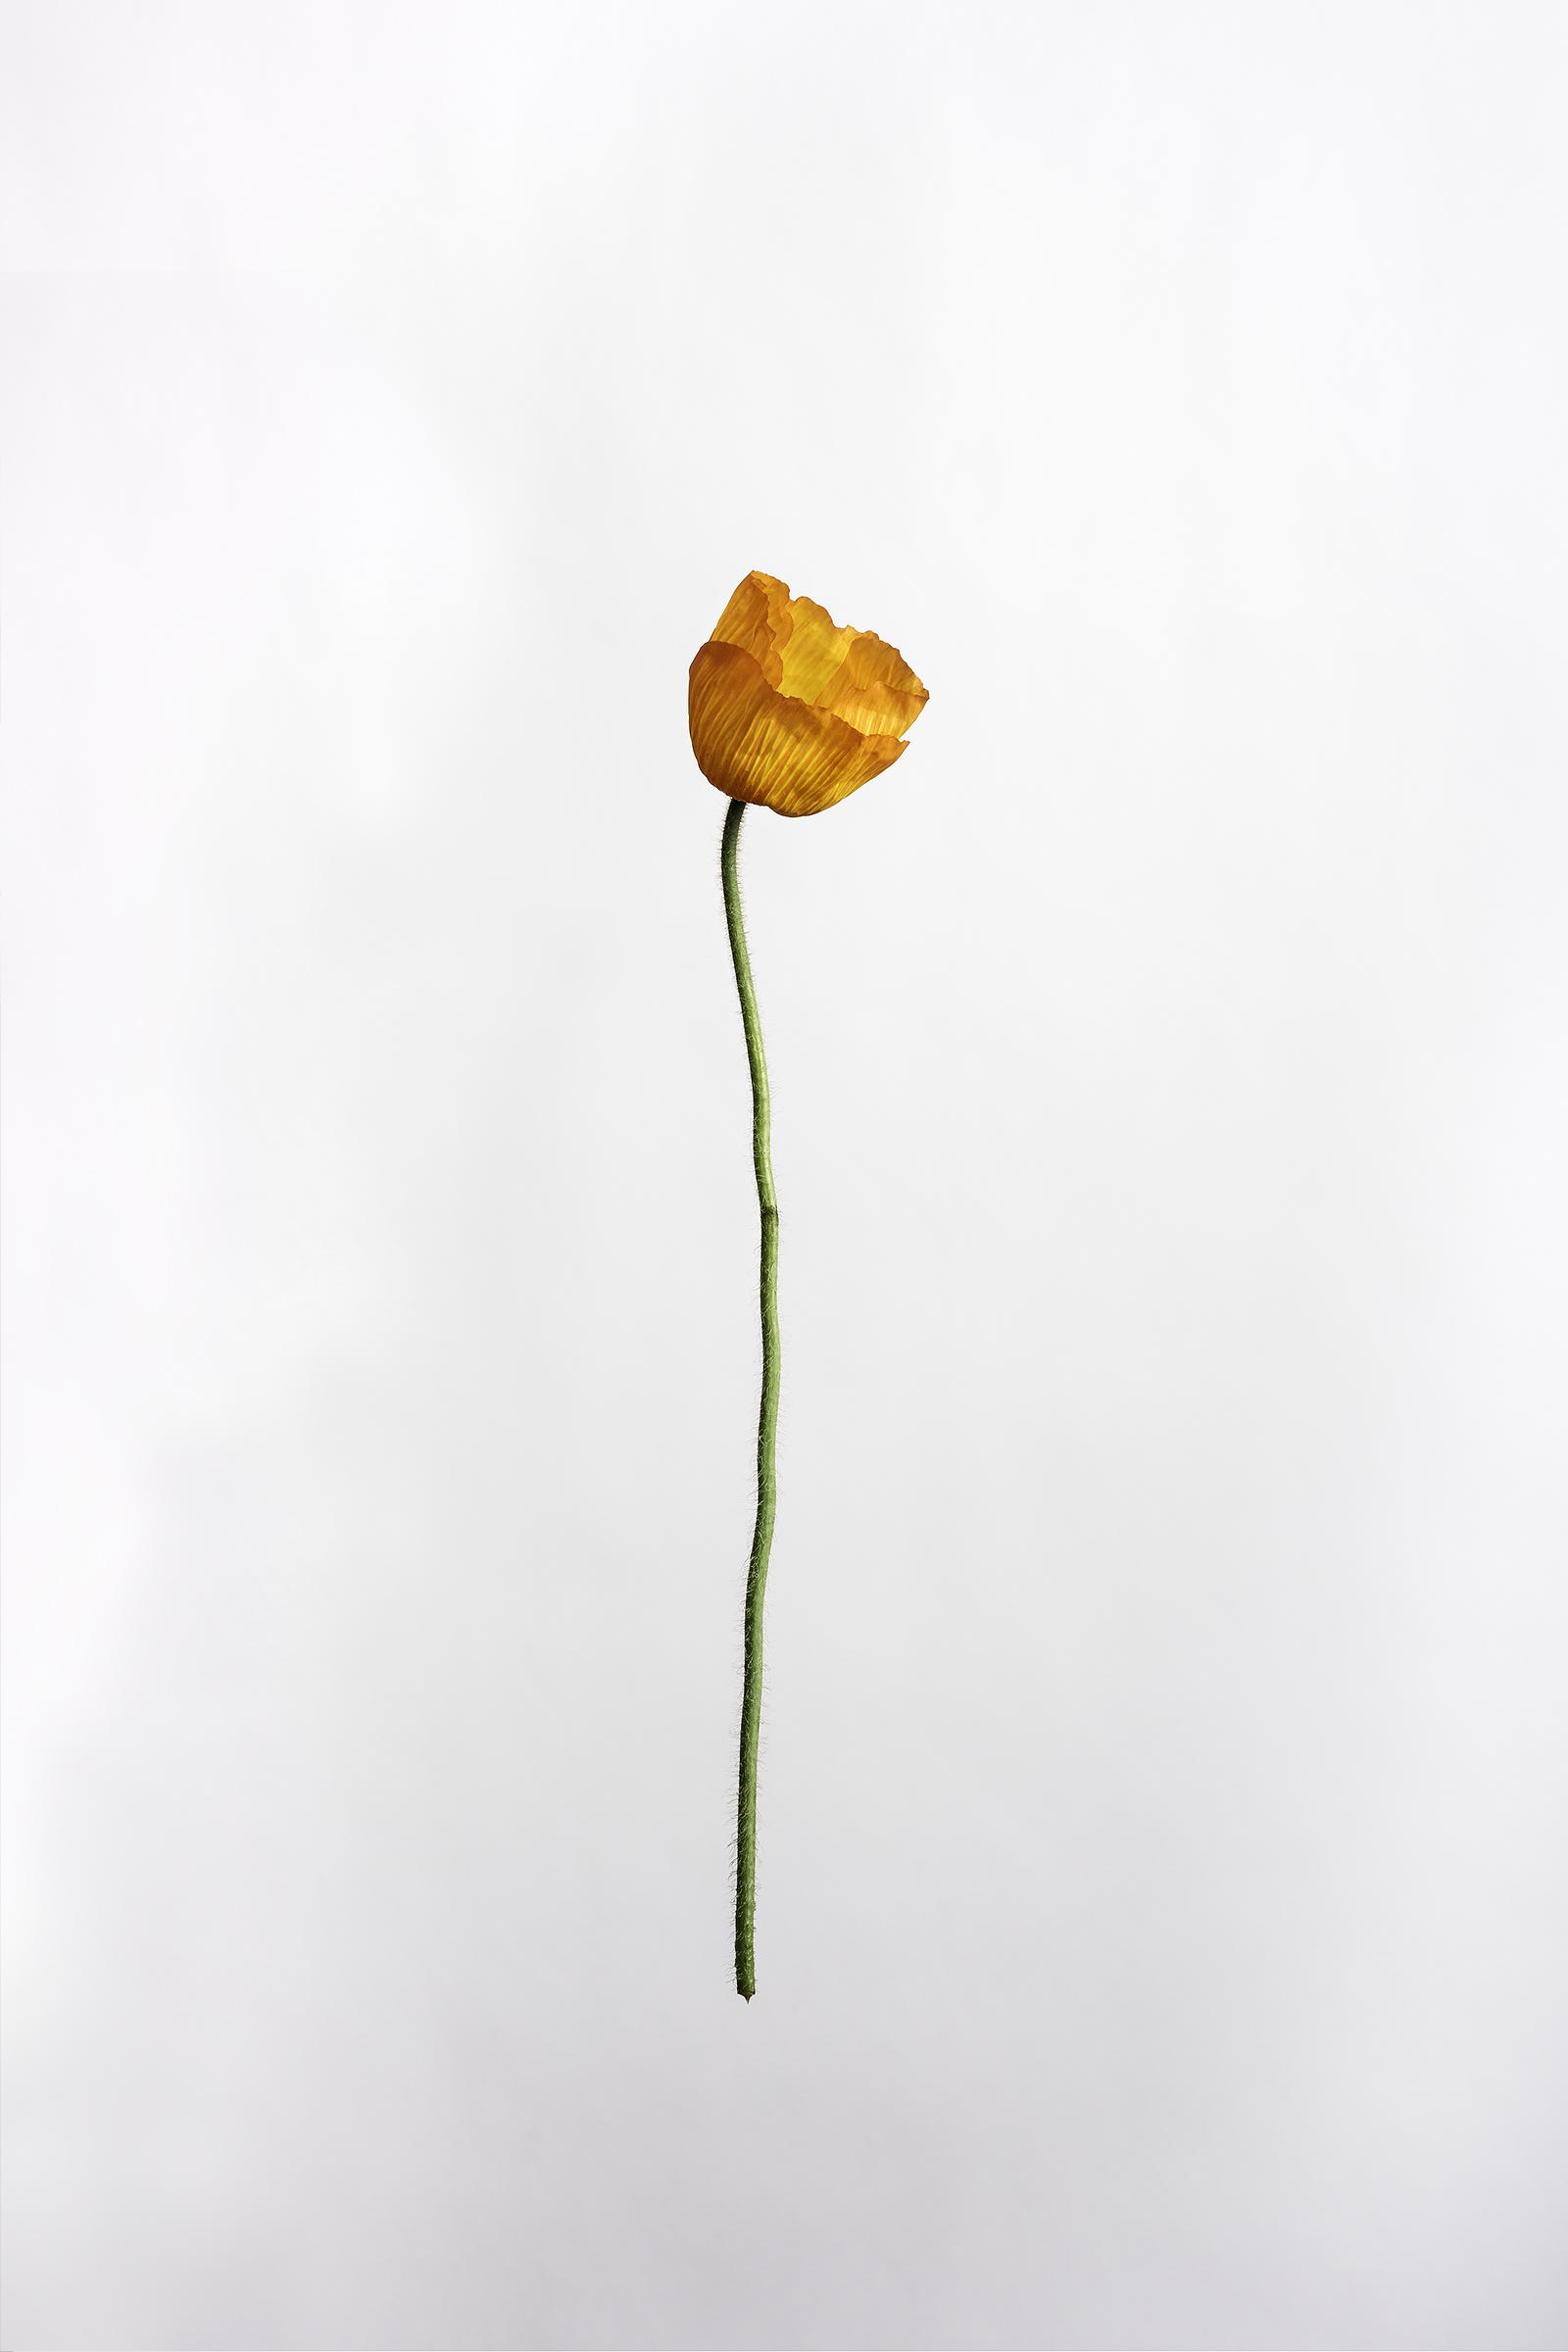 Papaver nudicaule - Iceland Poppy